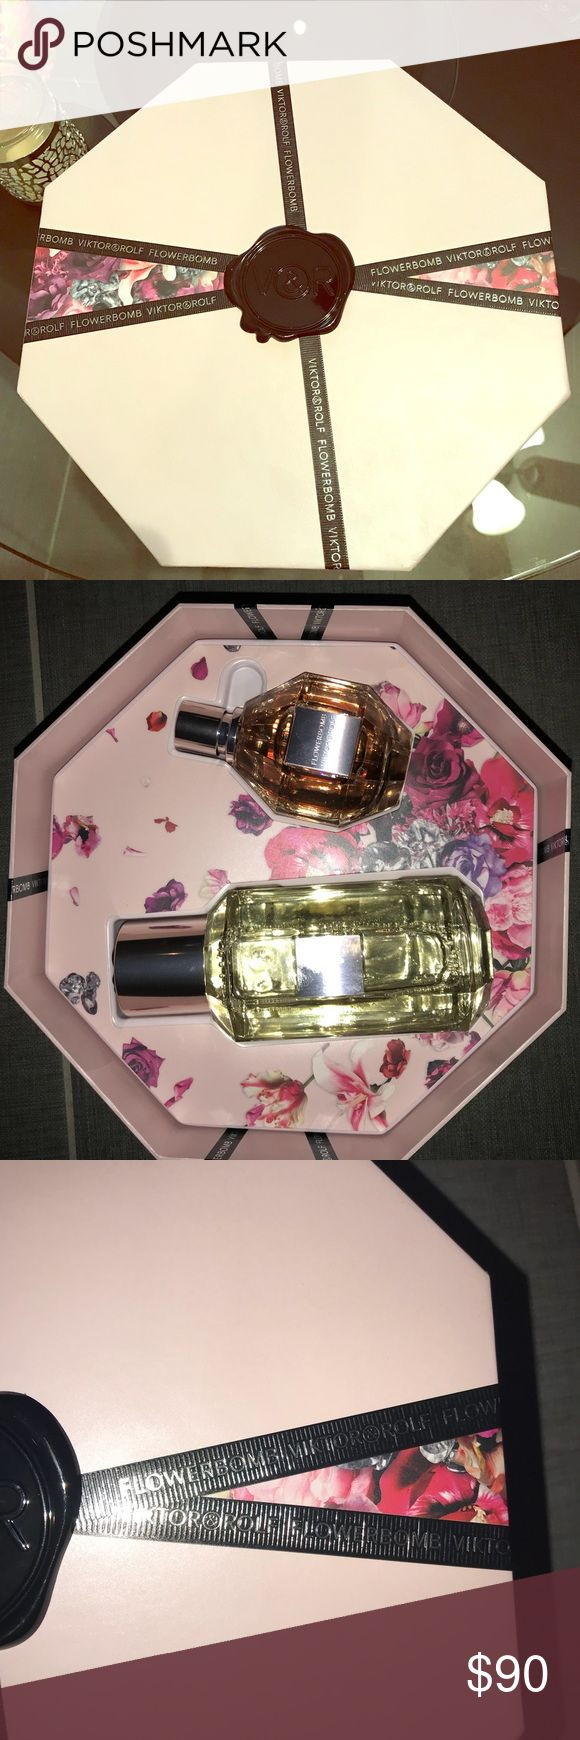 Viktor&Rolf Flowerbomb Perfume gift set Gift set includes : eau de parfum (3.4 fl oz) and bomblicious foaming bath (10.3 fl oz) Brand new , never used Viktor & Rolf Other